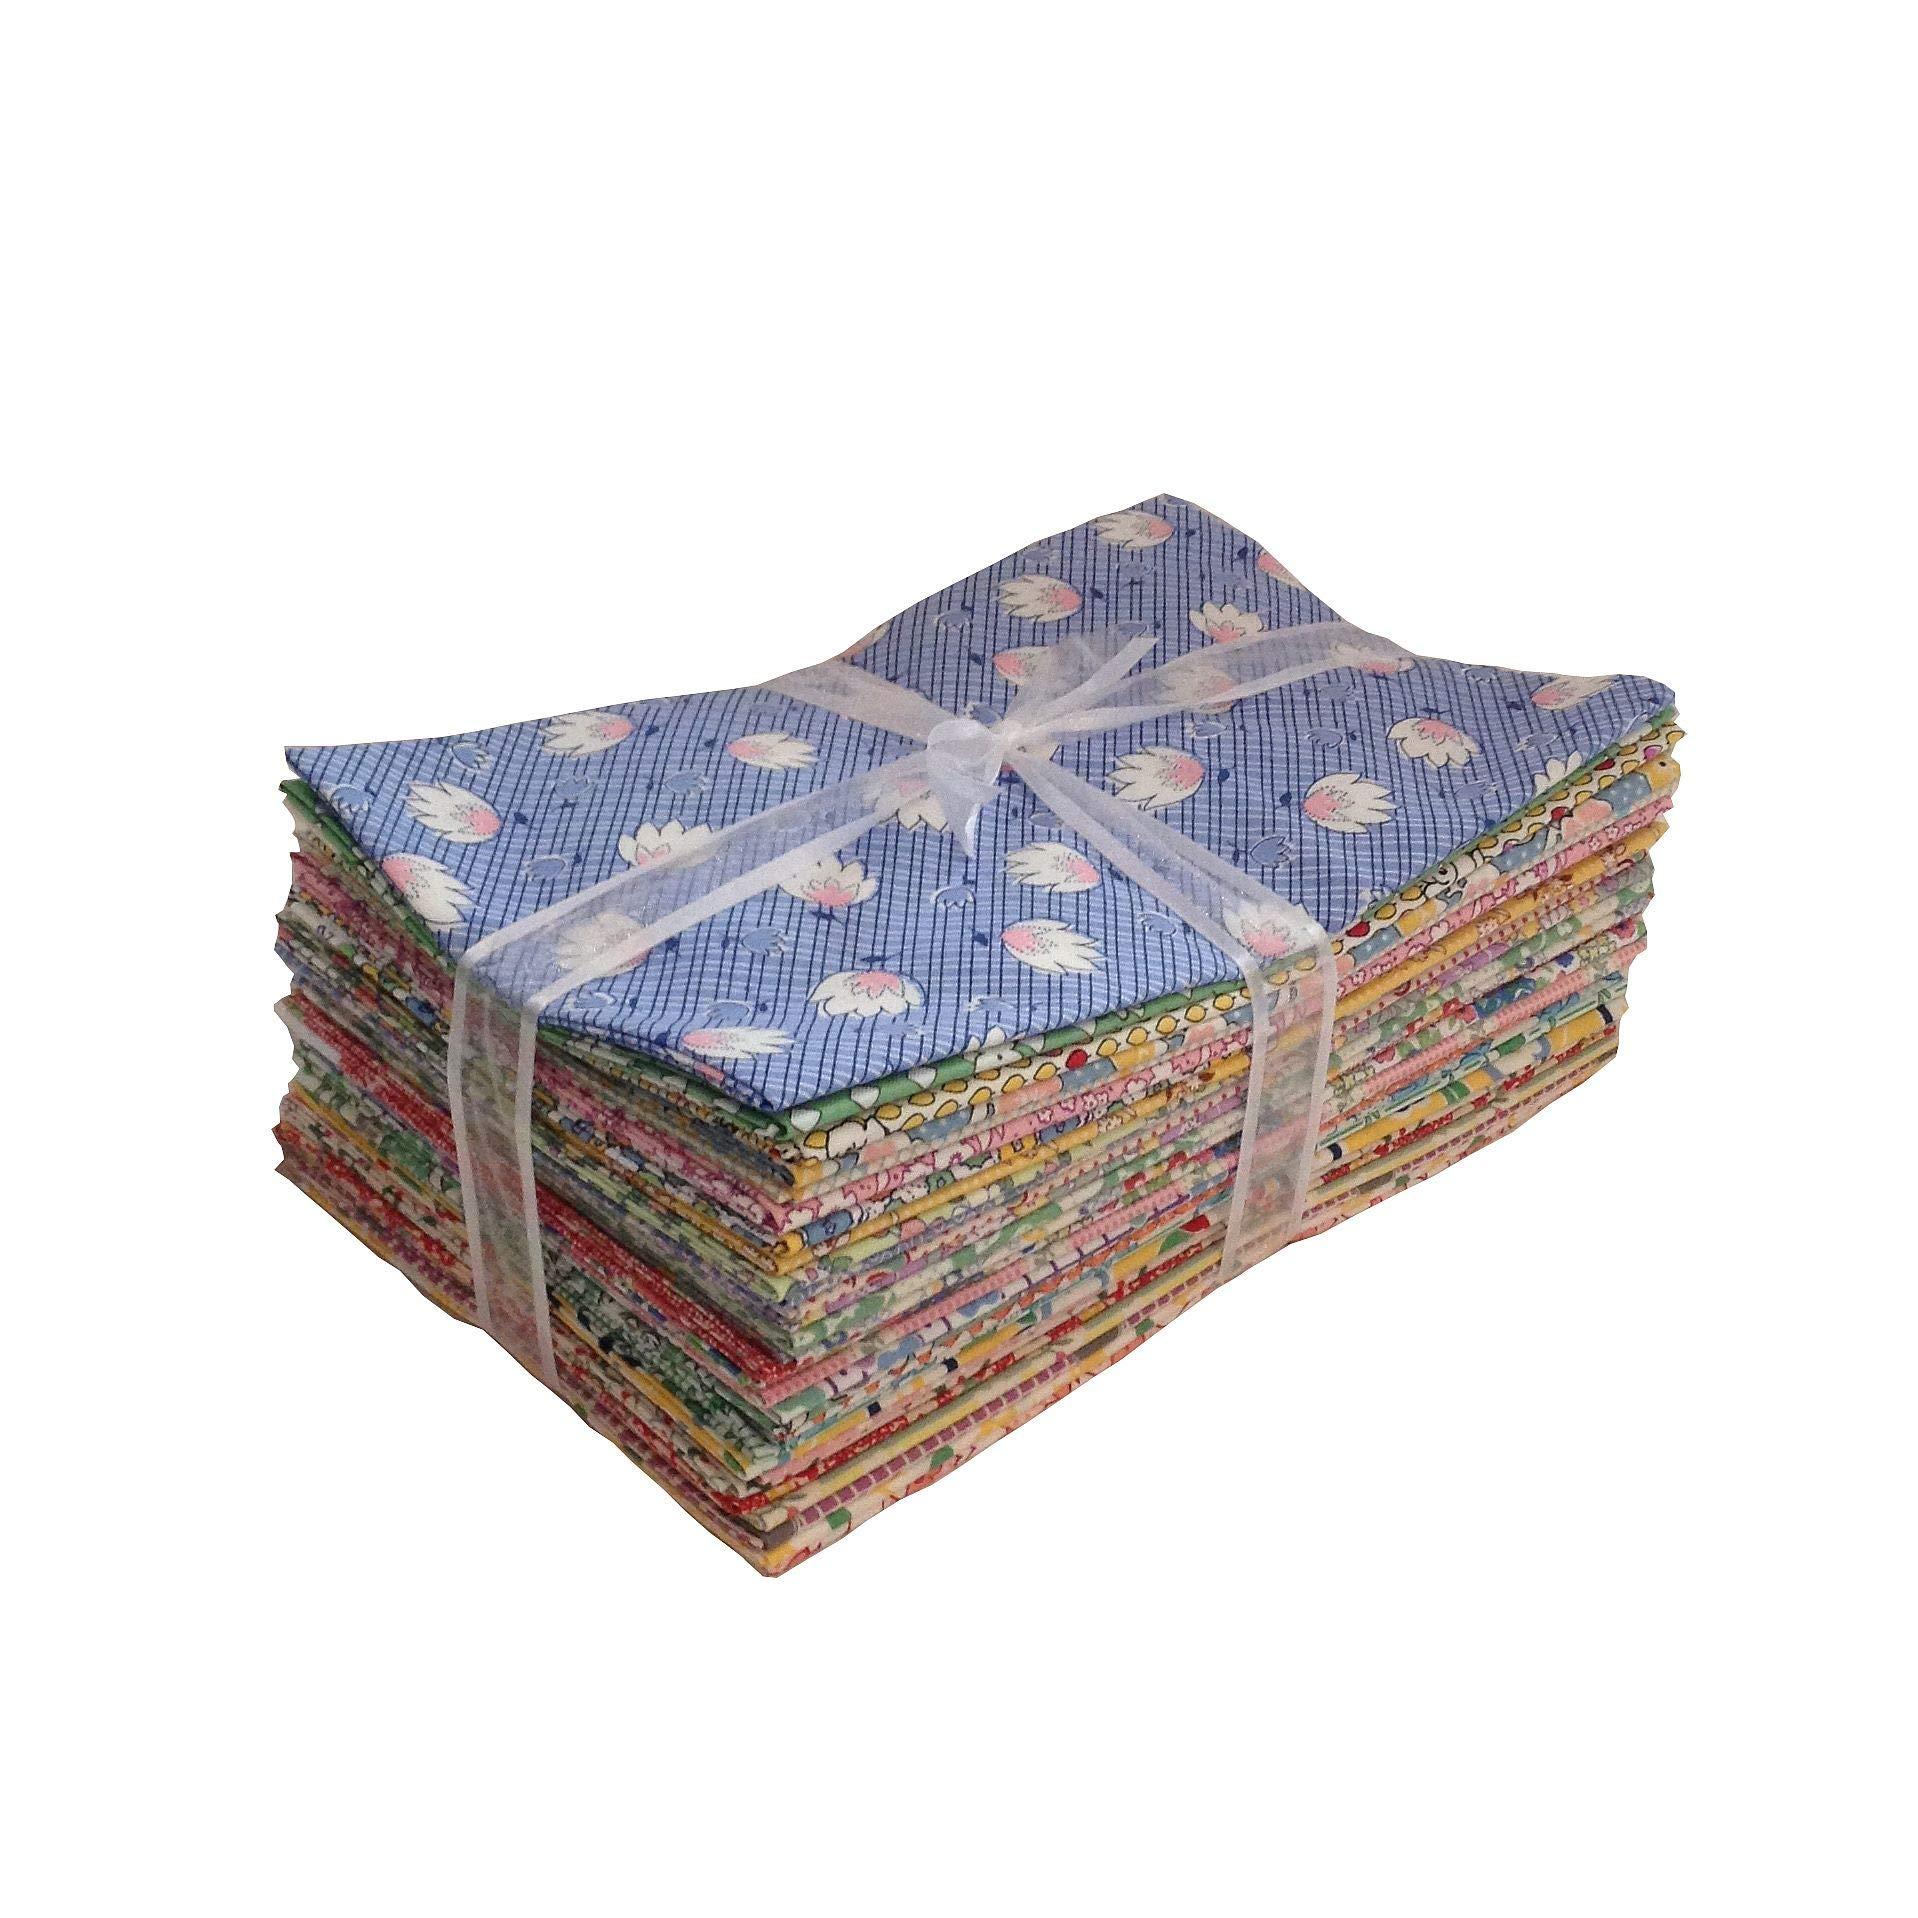 30 1930s Reproduction Fabric Fat Quarters Quilt Shop Quality No Duplicates